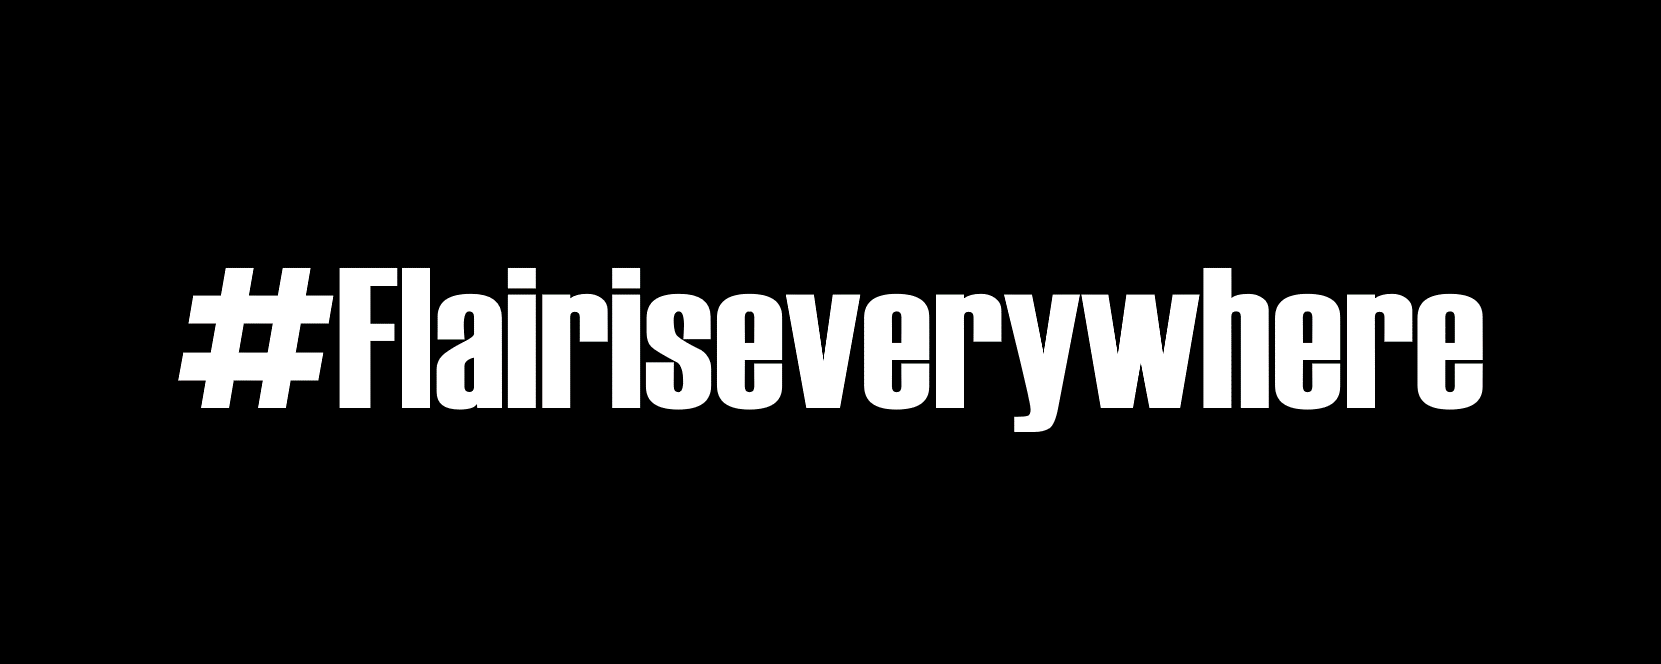 #Flairiseverywhere